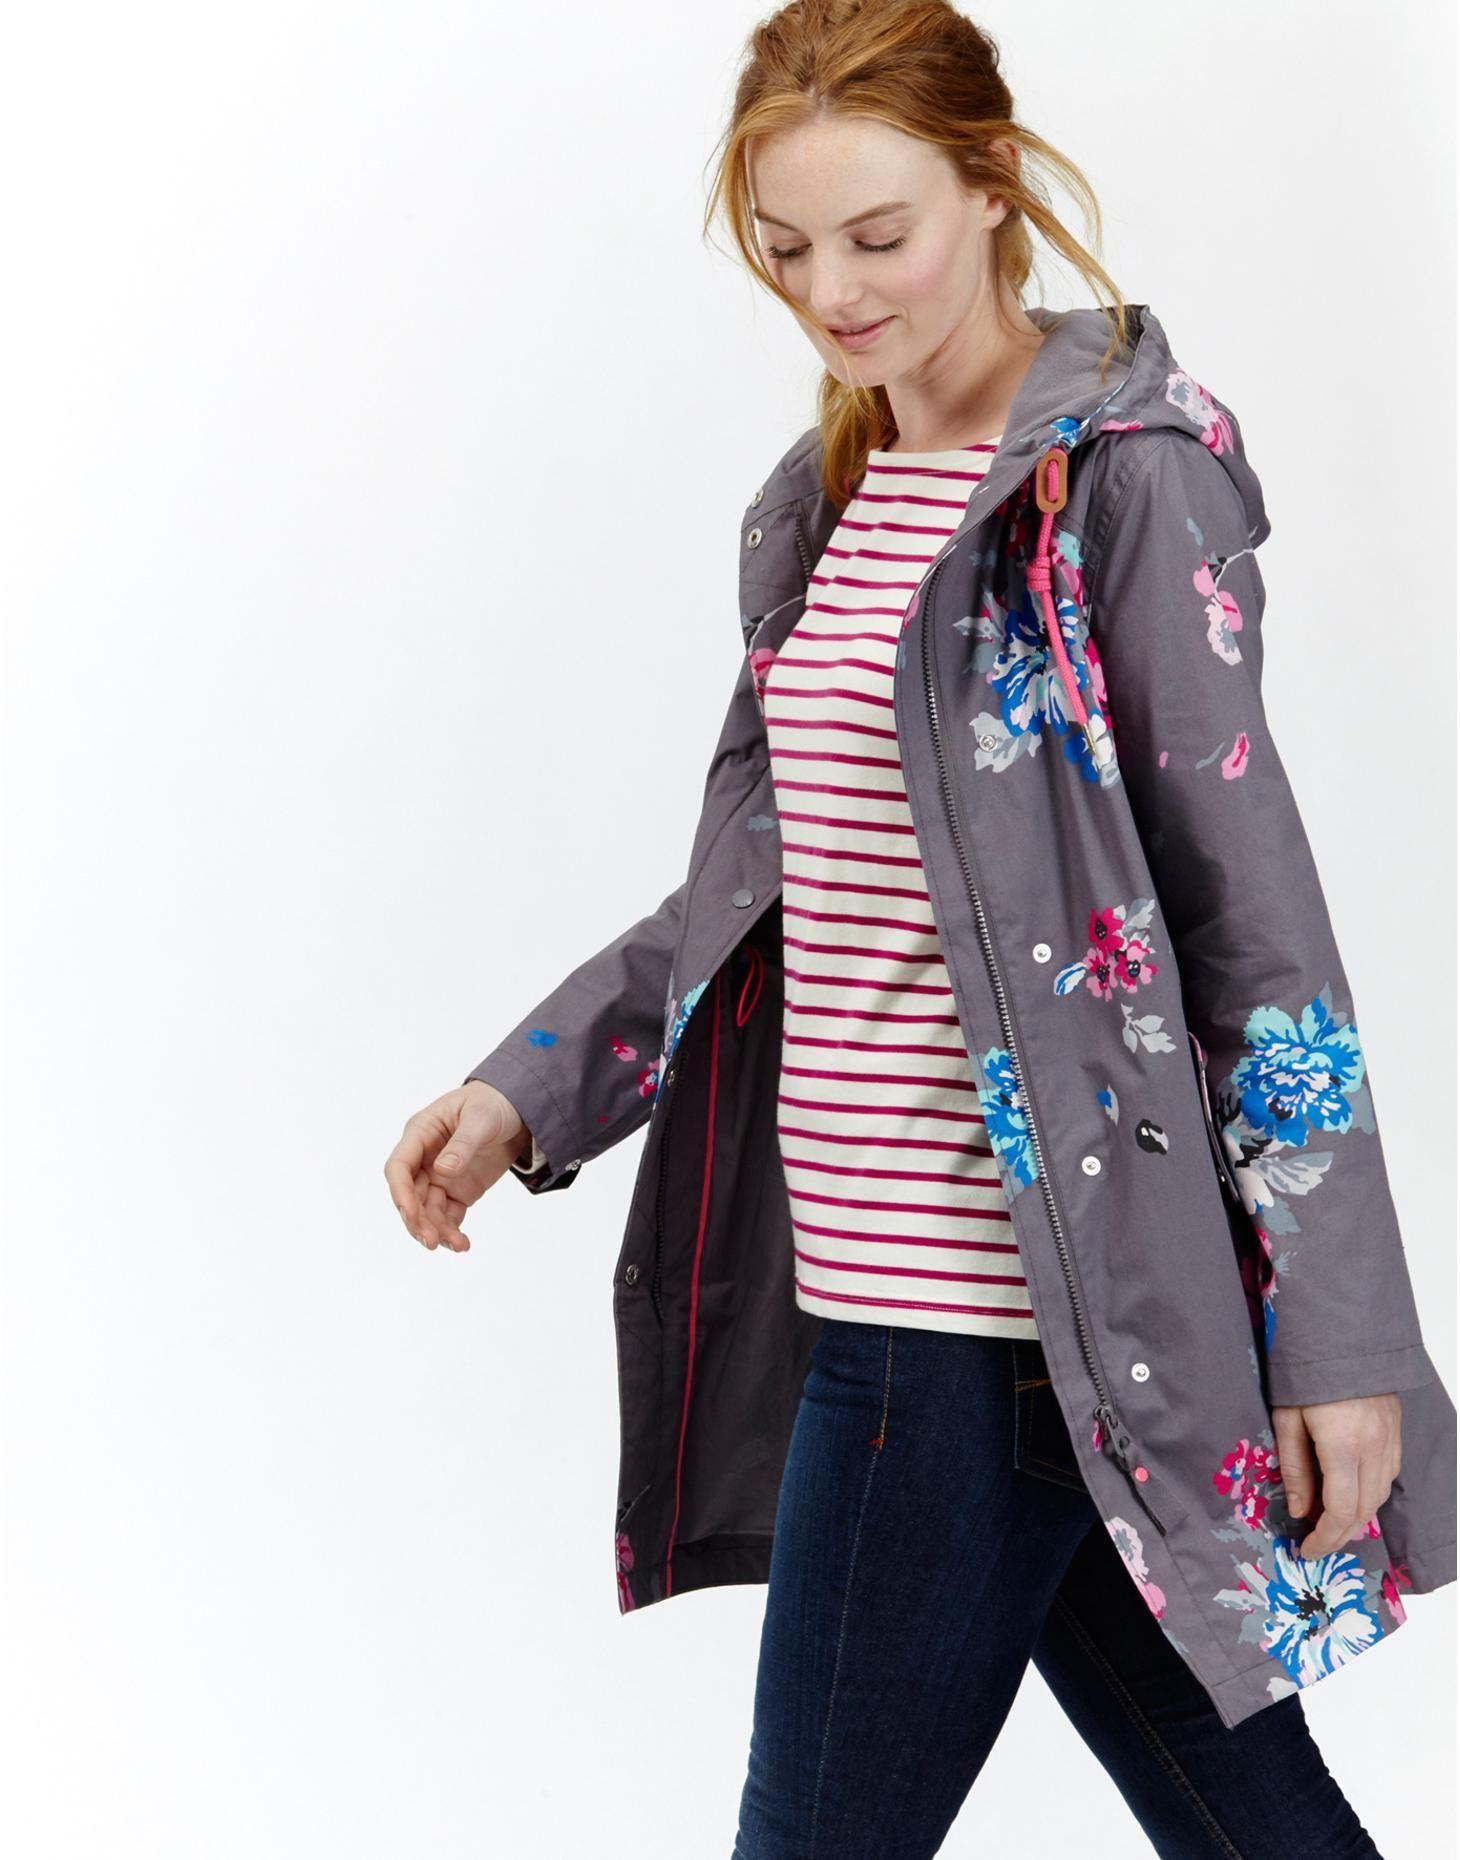 69088d19c4f Raina Slate Posy Waterproof Parka | Joules UK | Cute clothes ...